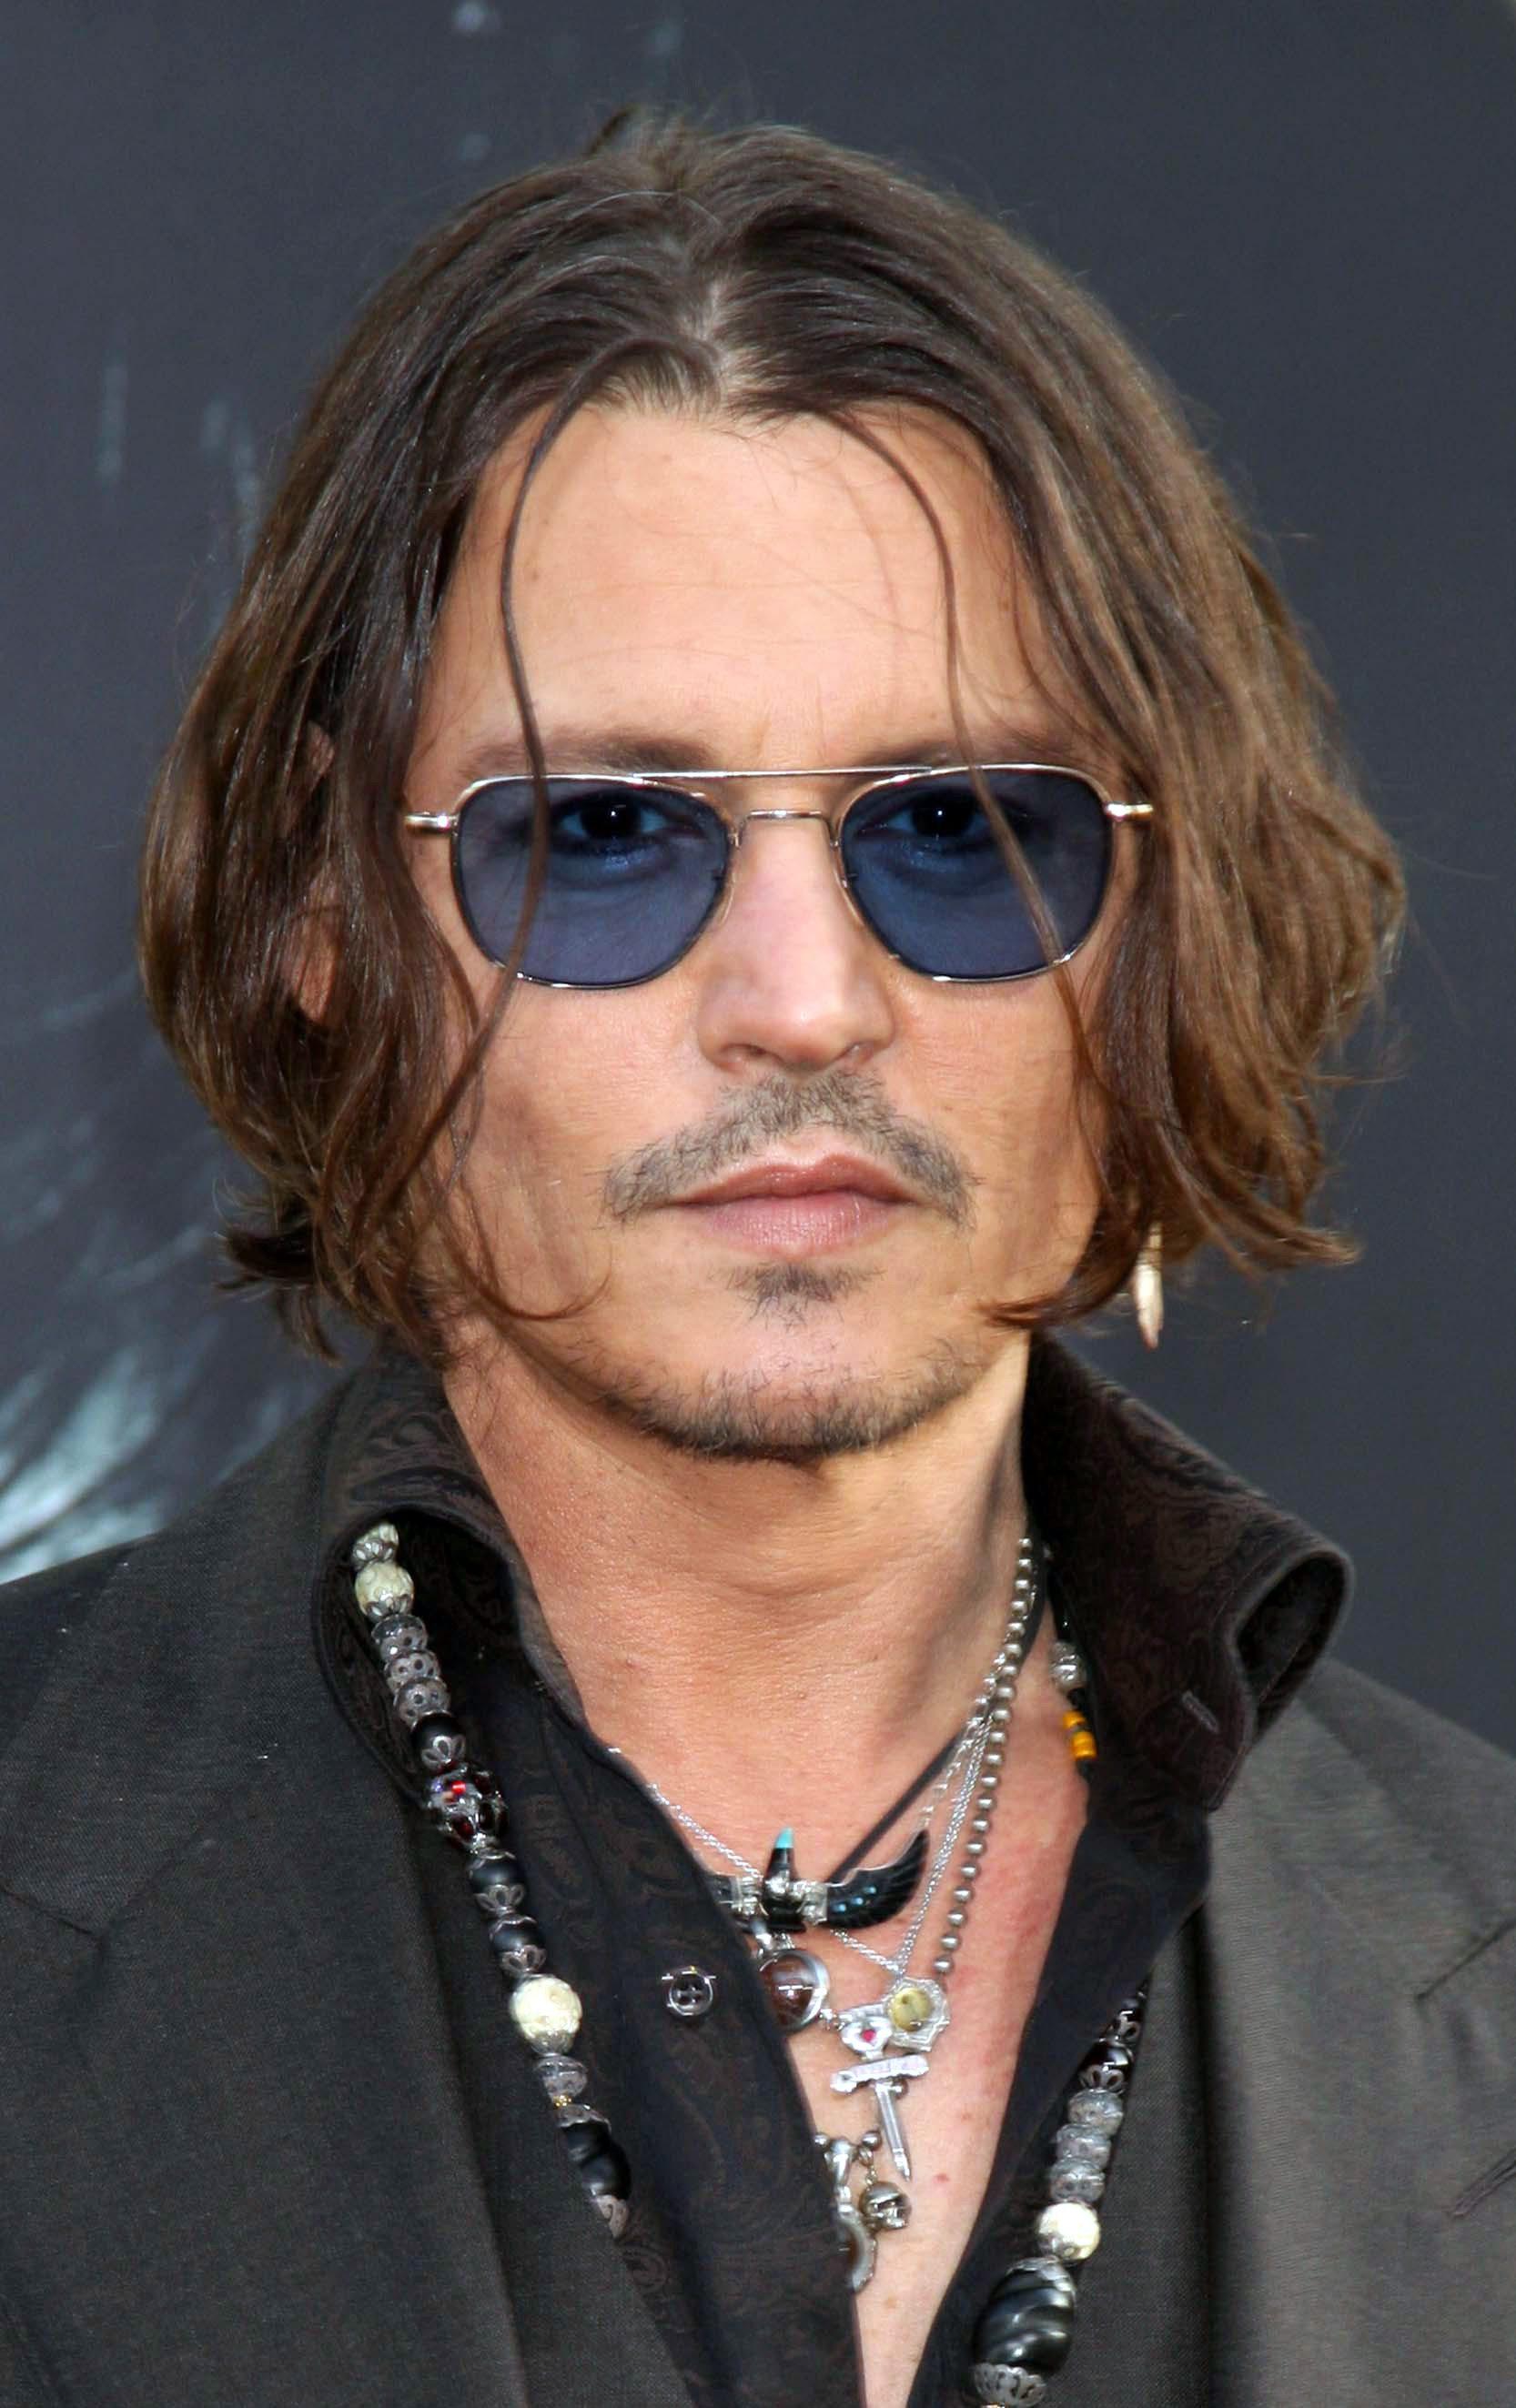 Jhonny Depp's Man Bob